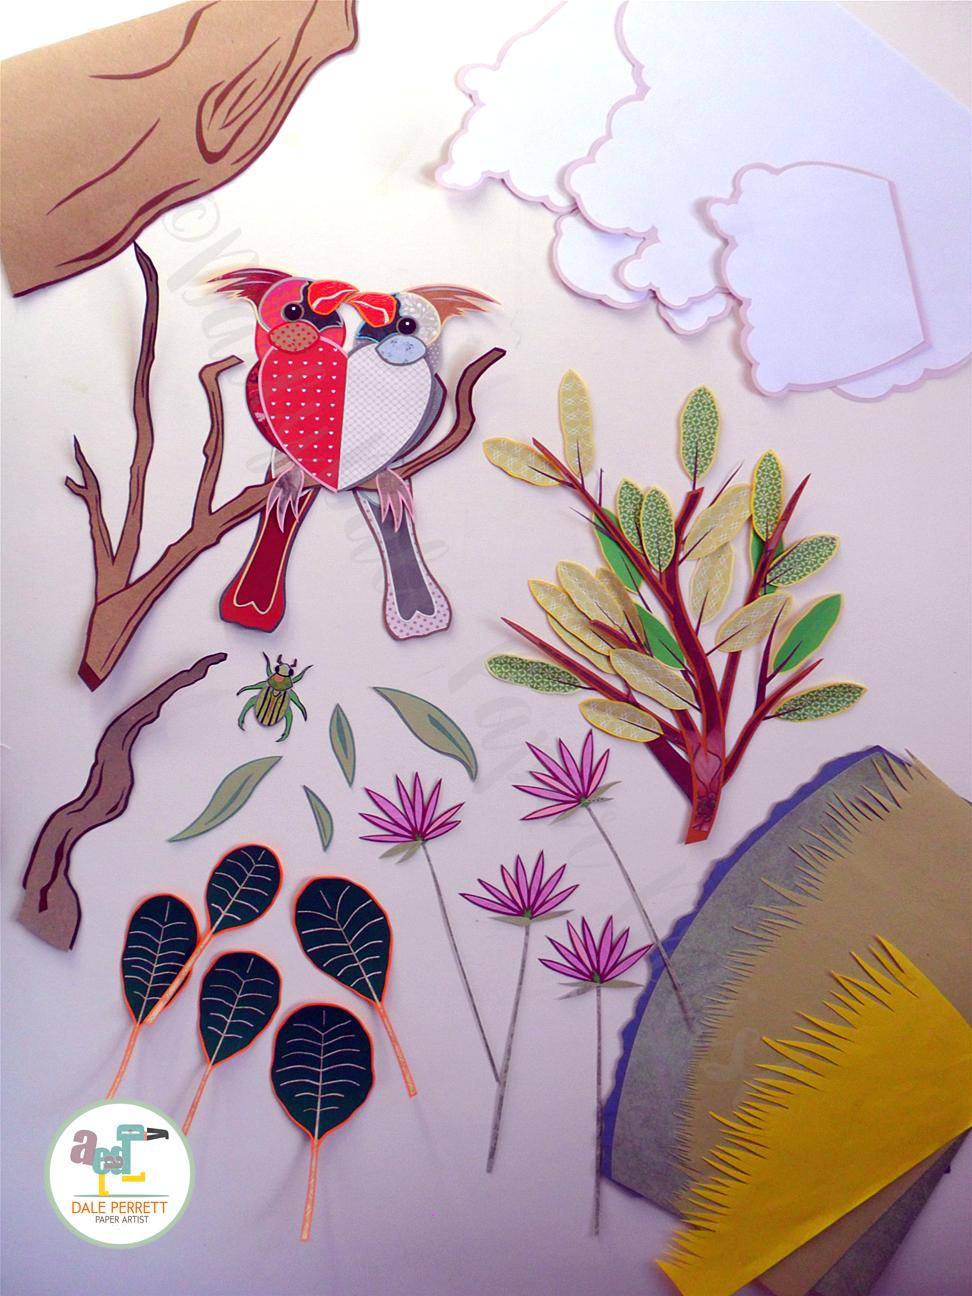 Cardinal birds paper illustration, various paper parts in construction.